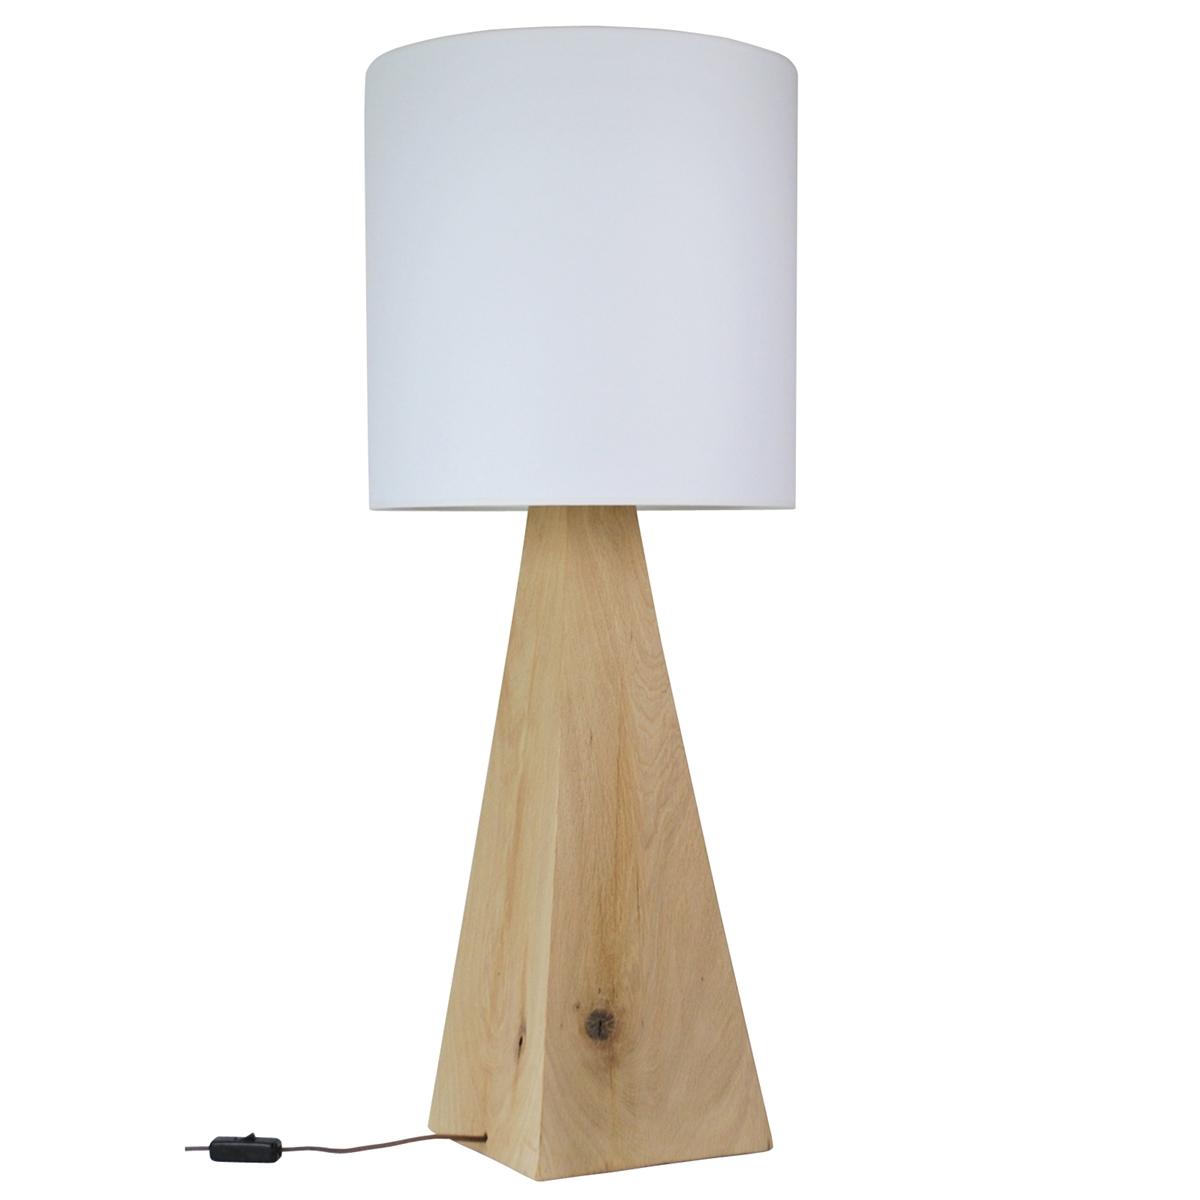 marque open design. Black Bedroom Furniture Sets. Home Design Ideas